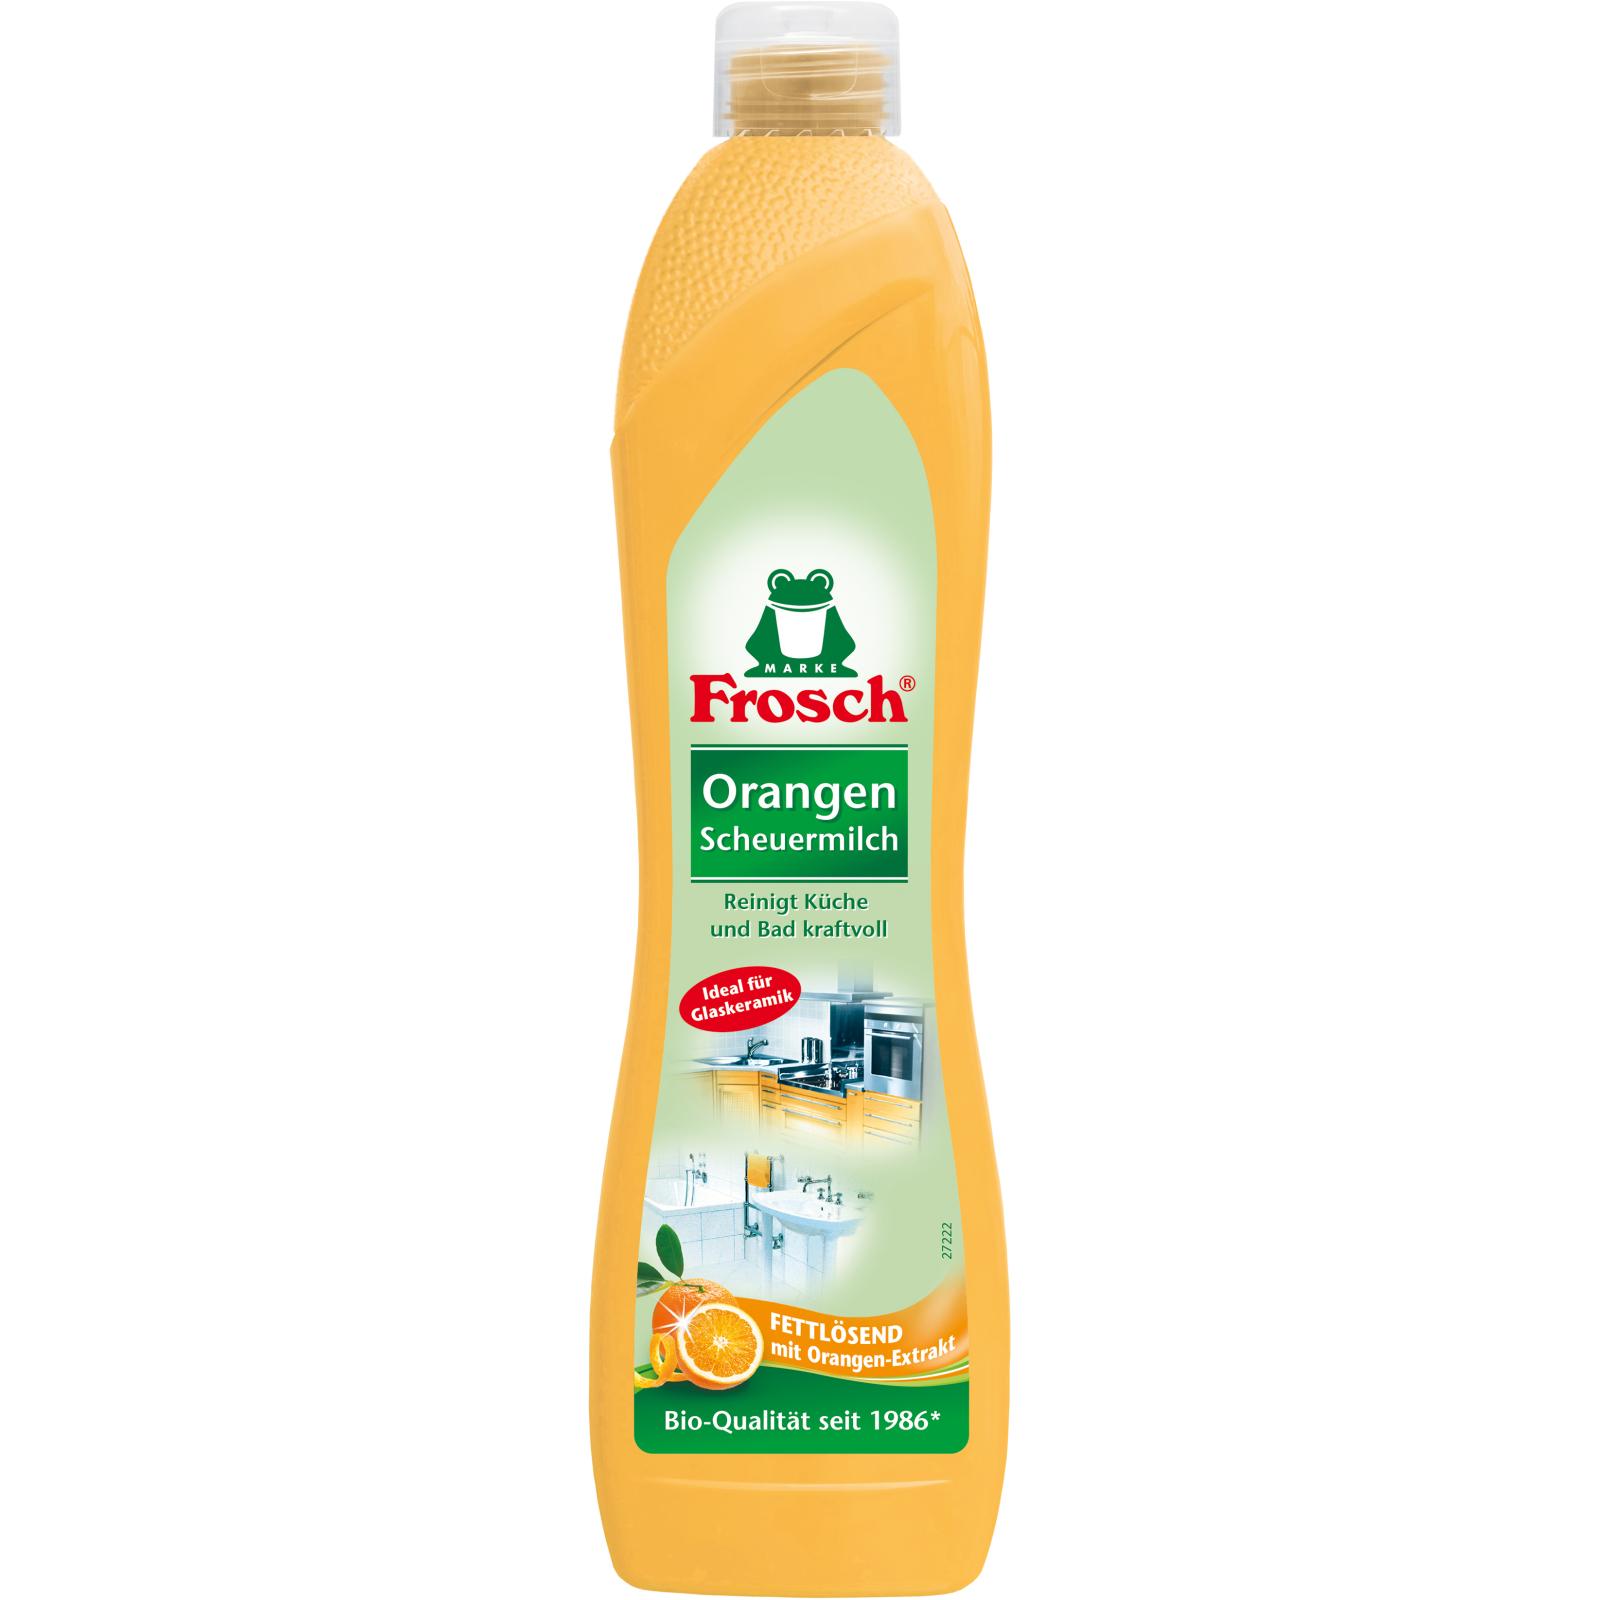 Чистящее средство Frosch Апельсин 500 мл (4009175148070)